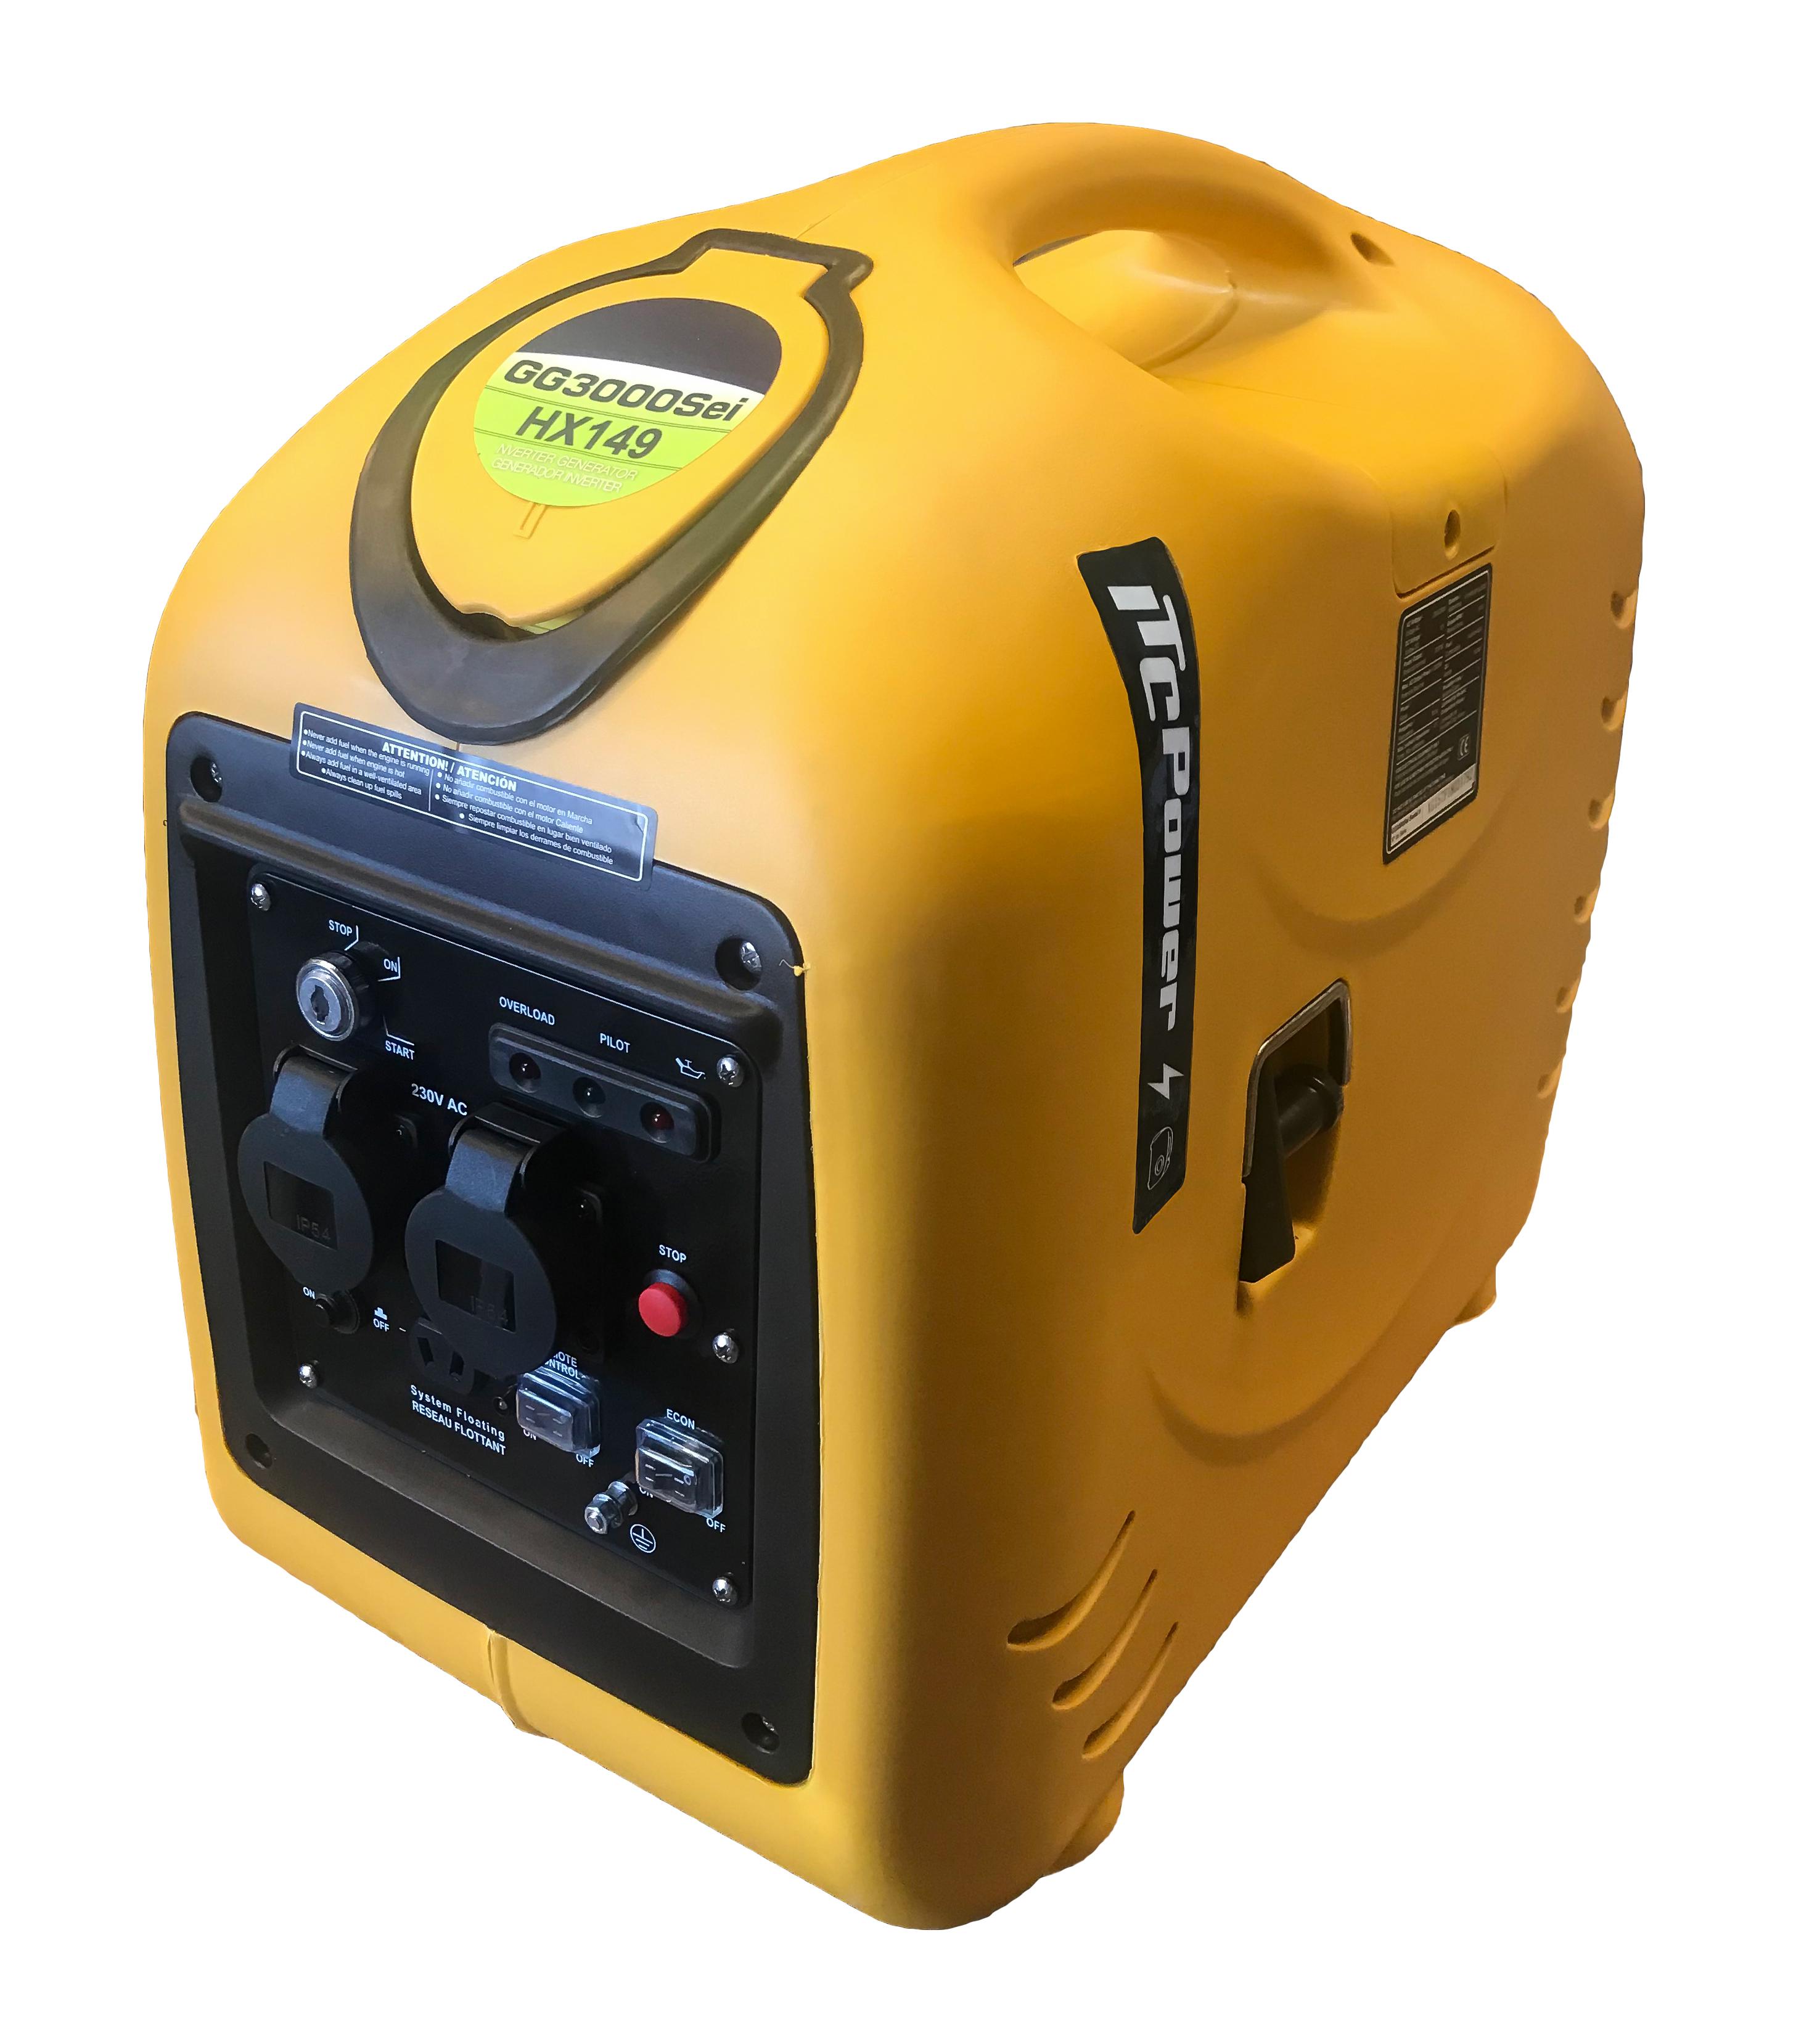 ITC POWER Inverter 3300Watt Benzin GG3000SEI-R Stromaggregat